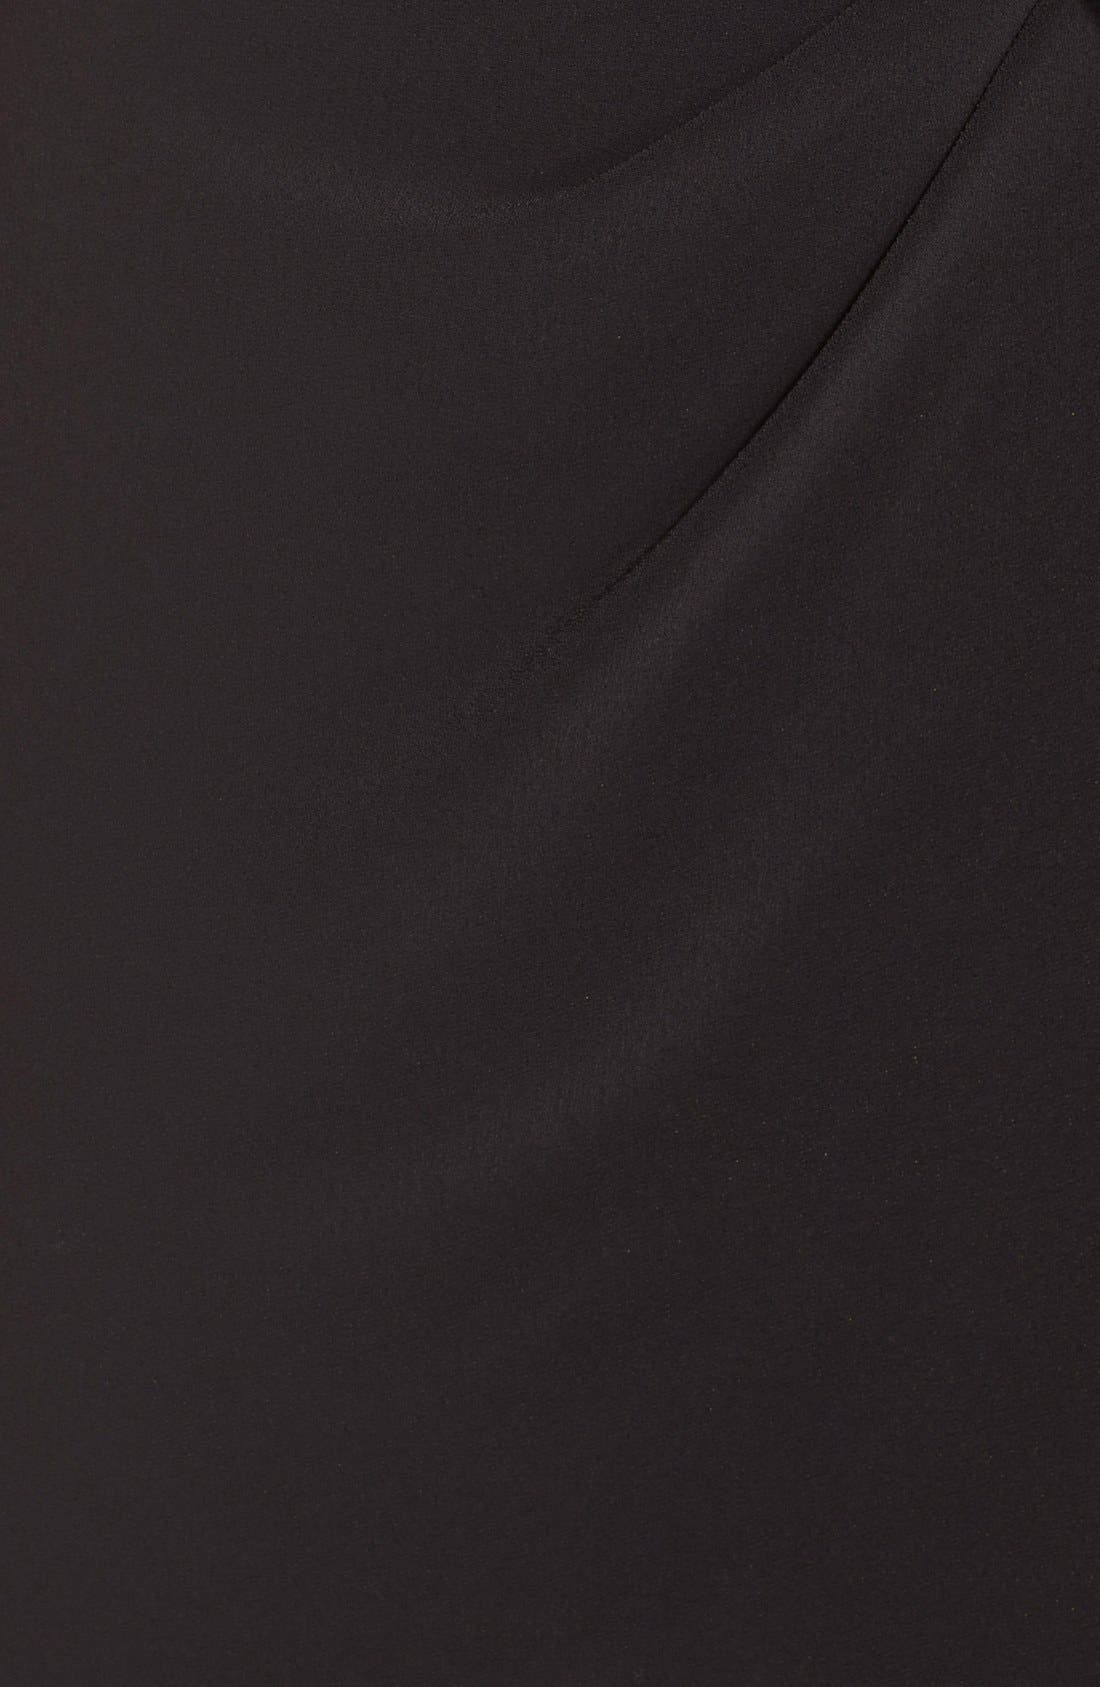 Side Tie Jersey Sheath Dress,                             Alternate thumbnail 6, color,                             Black